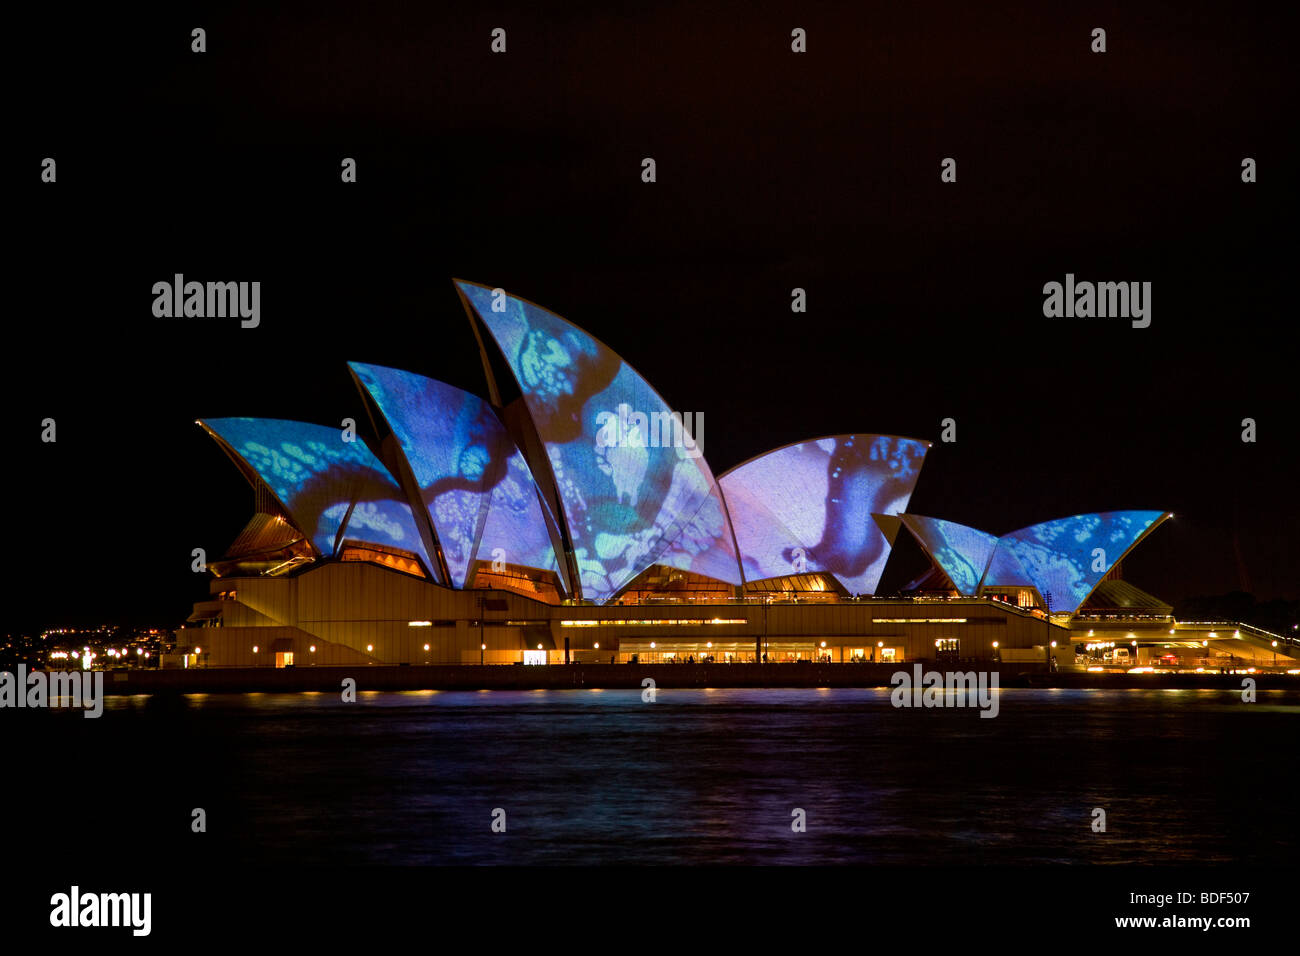 Australia, Sydney, the sails of Sydney Opera lit up in the LUMINOUS lightshow - Stock Image